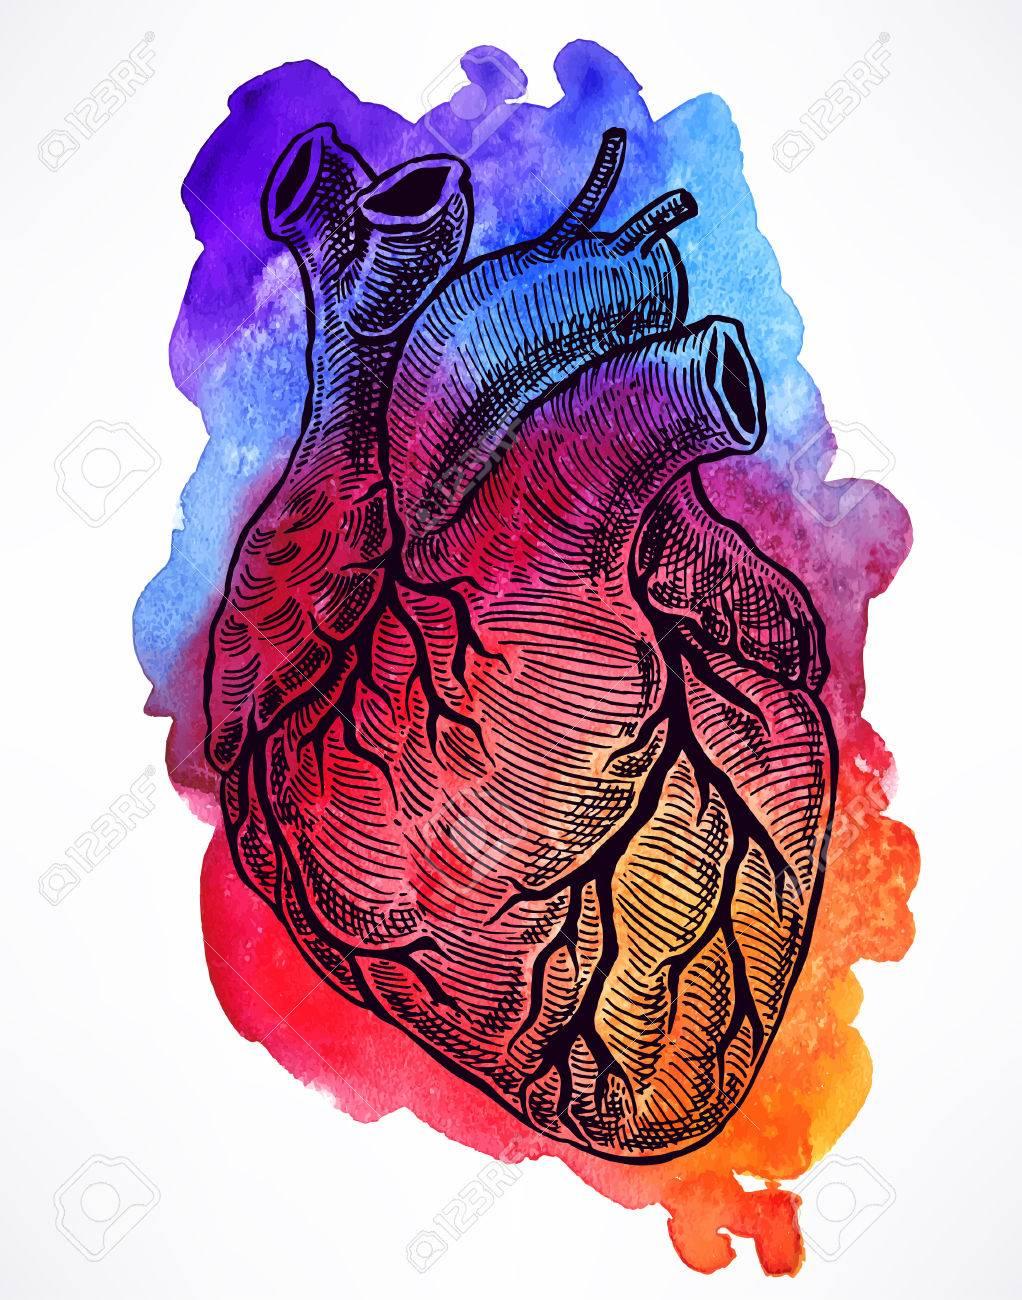 Beautiful human heart on a watercolor background hand drawn beautiful human heart on a watercolor background hand drawn illustration imagens 45842117 ccuart Choice Image